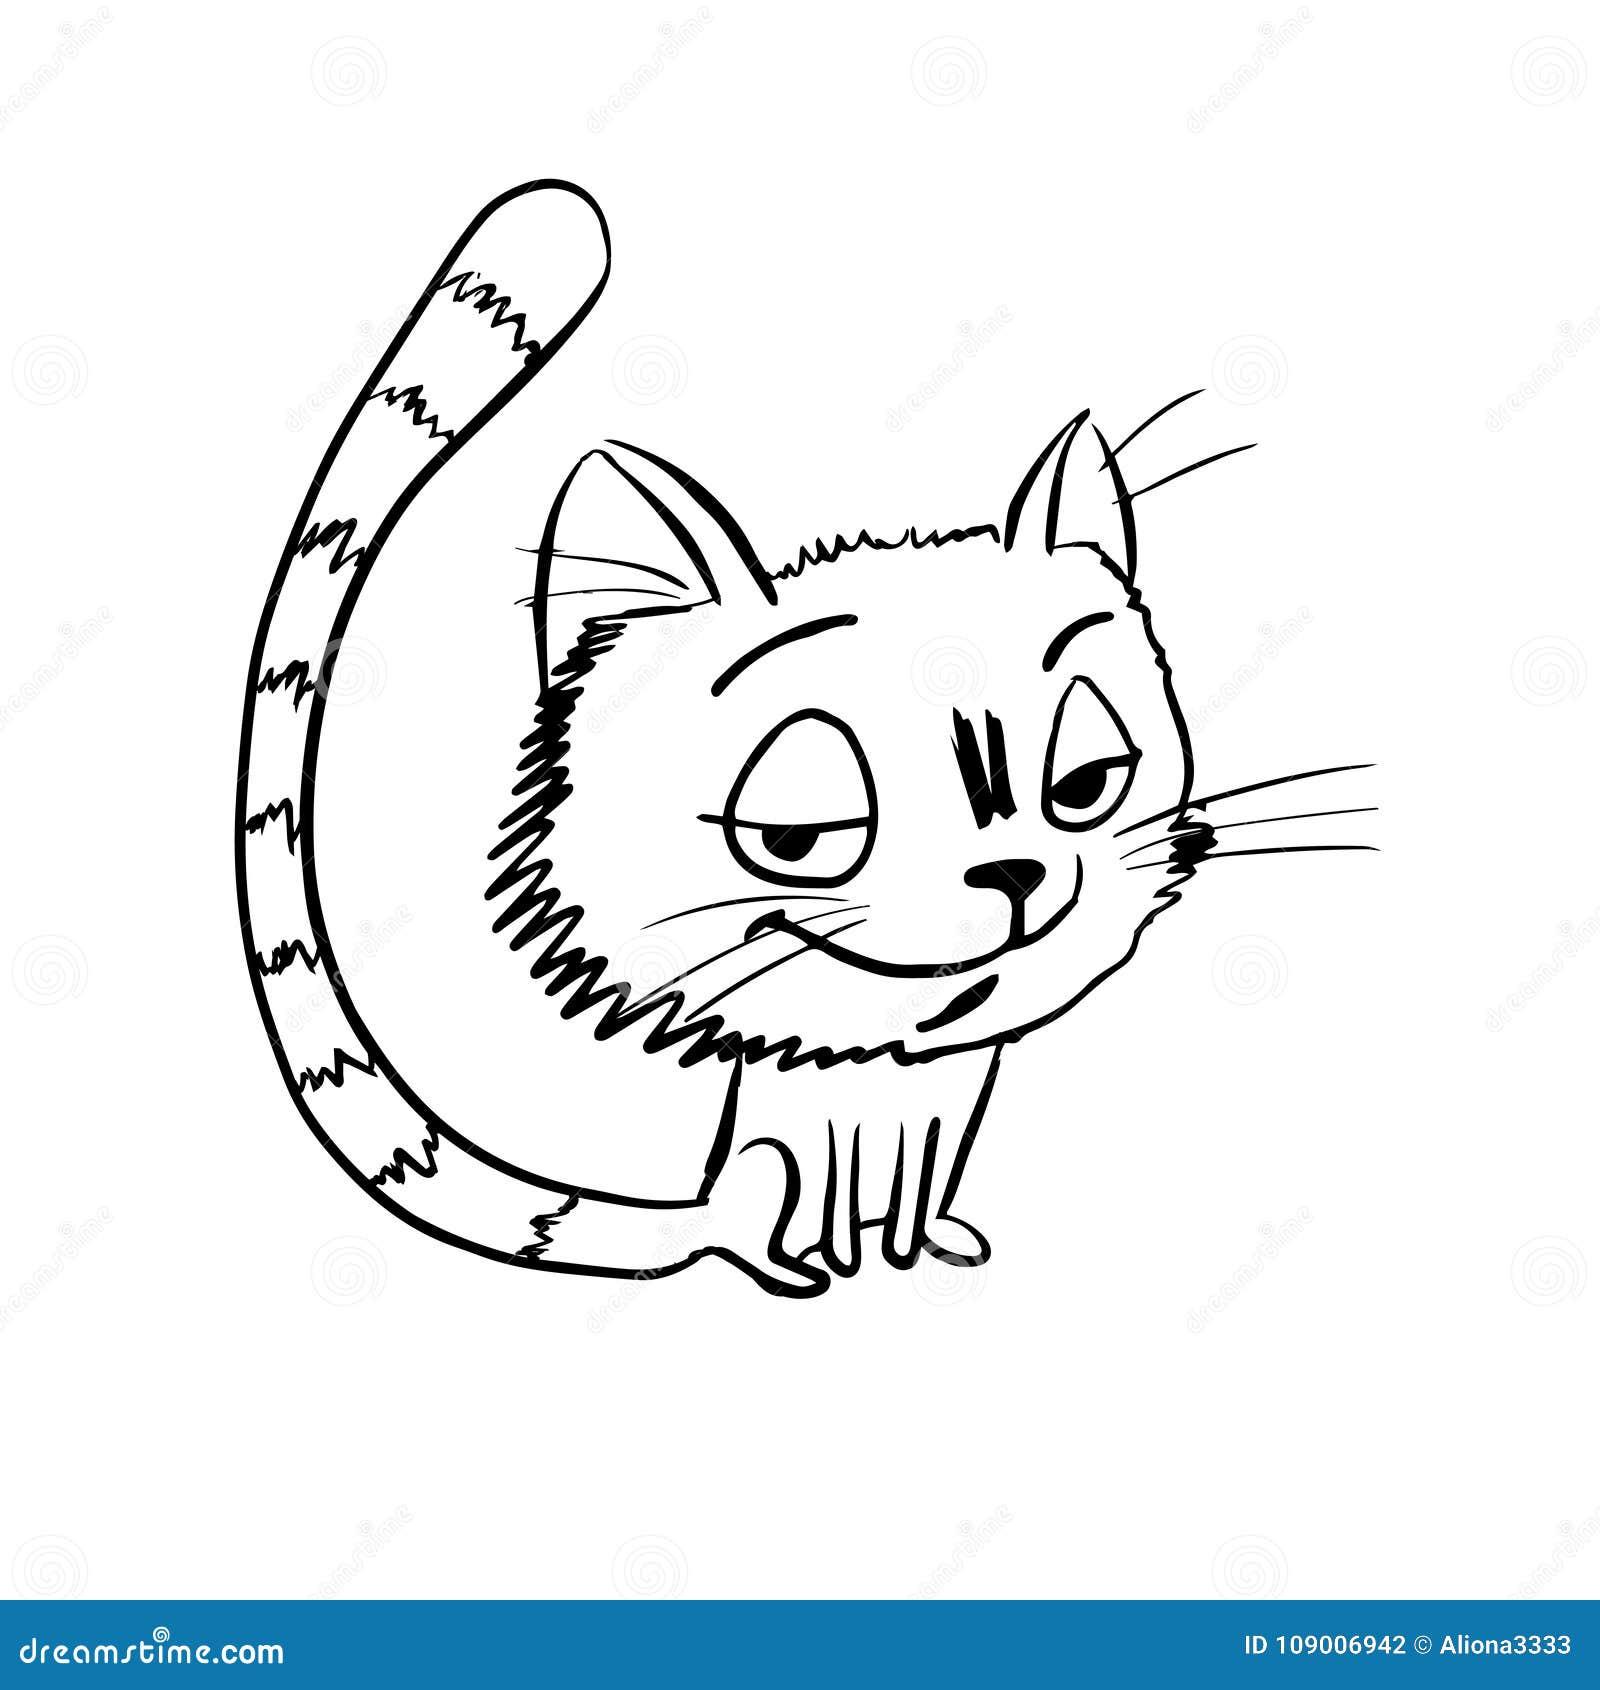 Den knepiga katten skissar